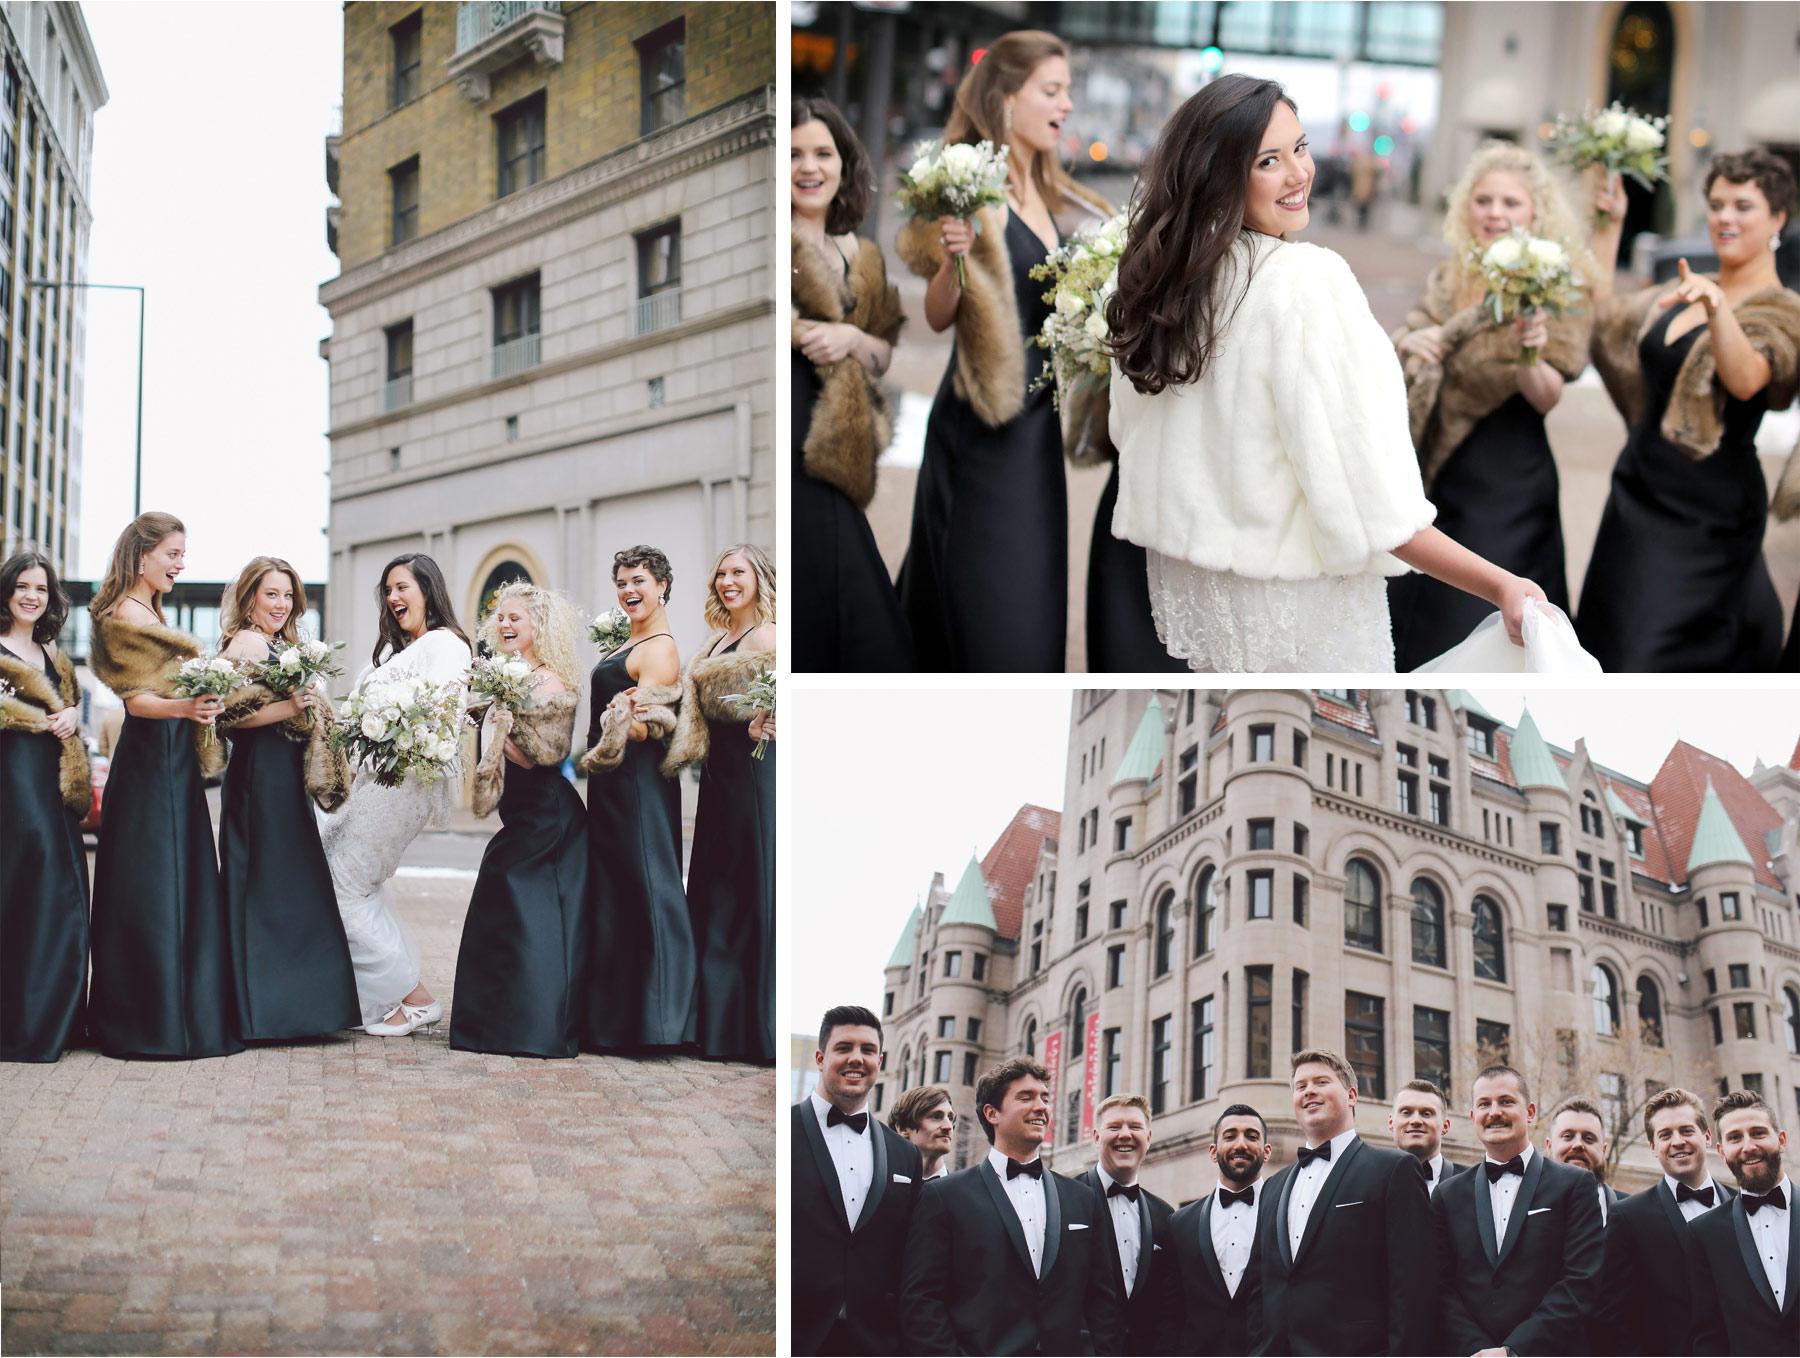 08-Saint-Paul-Minnesota-Wedding-Photography-by-Vick-Photography-Saint-Paul-Hotel-Wedding-Party-Group-Downtown-Winter-Wedding-Sami-and-Nick.jpg